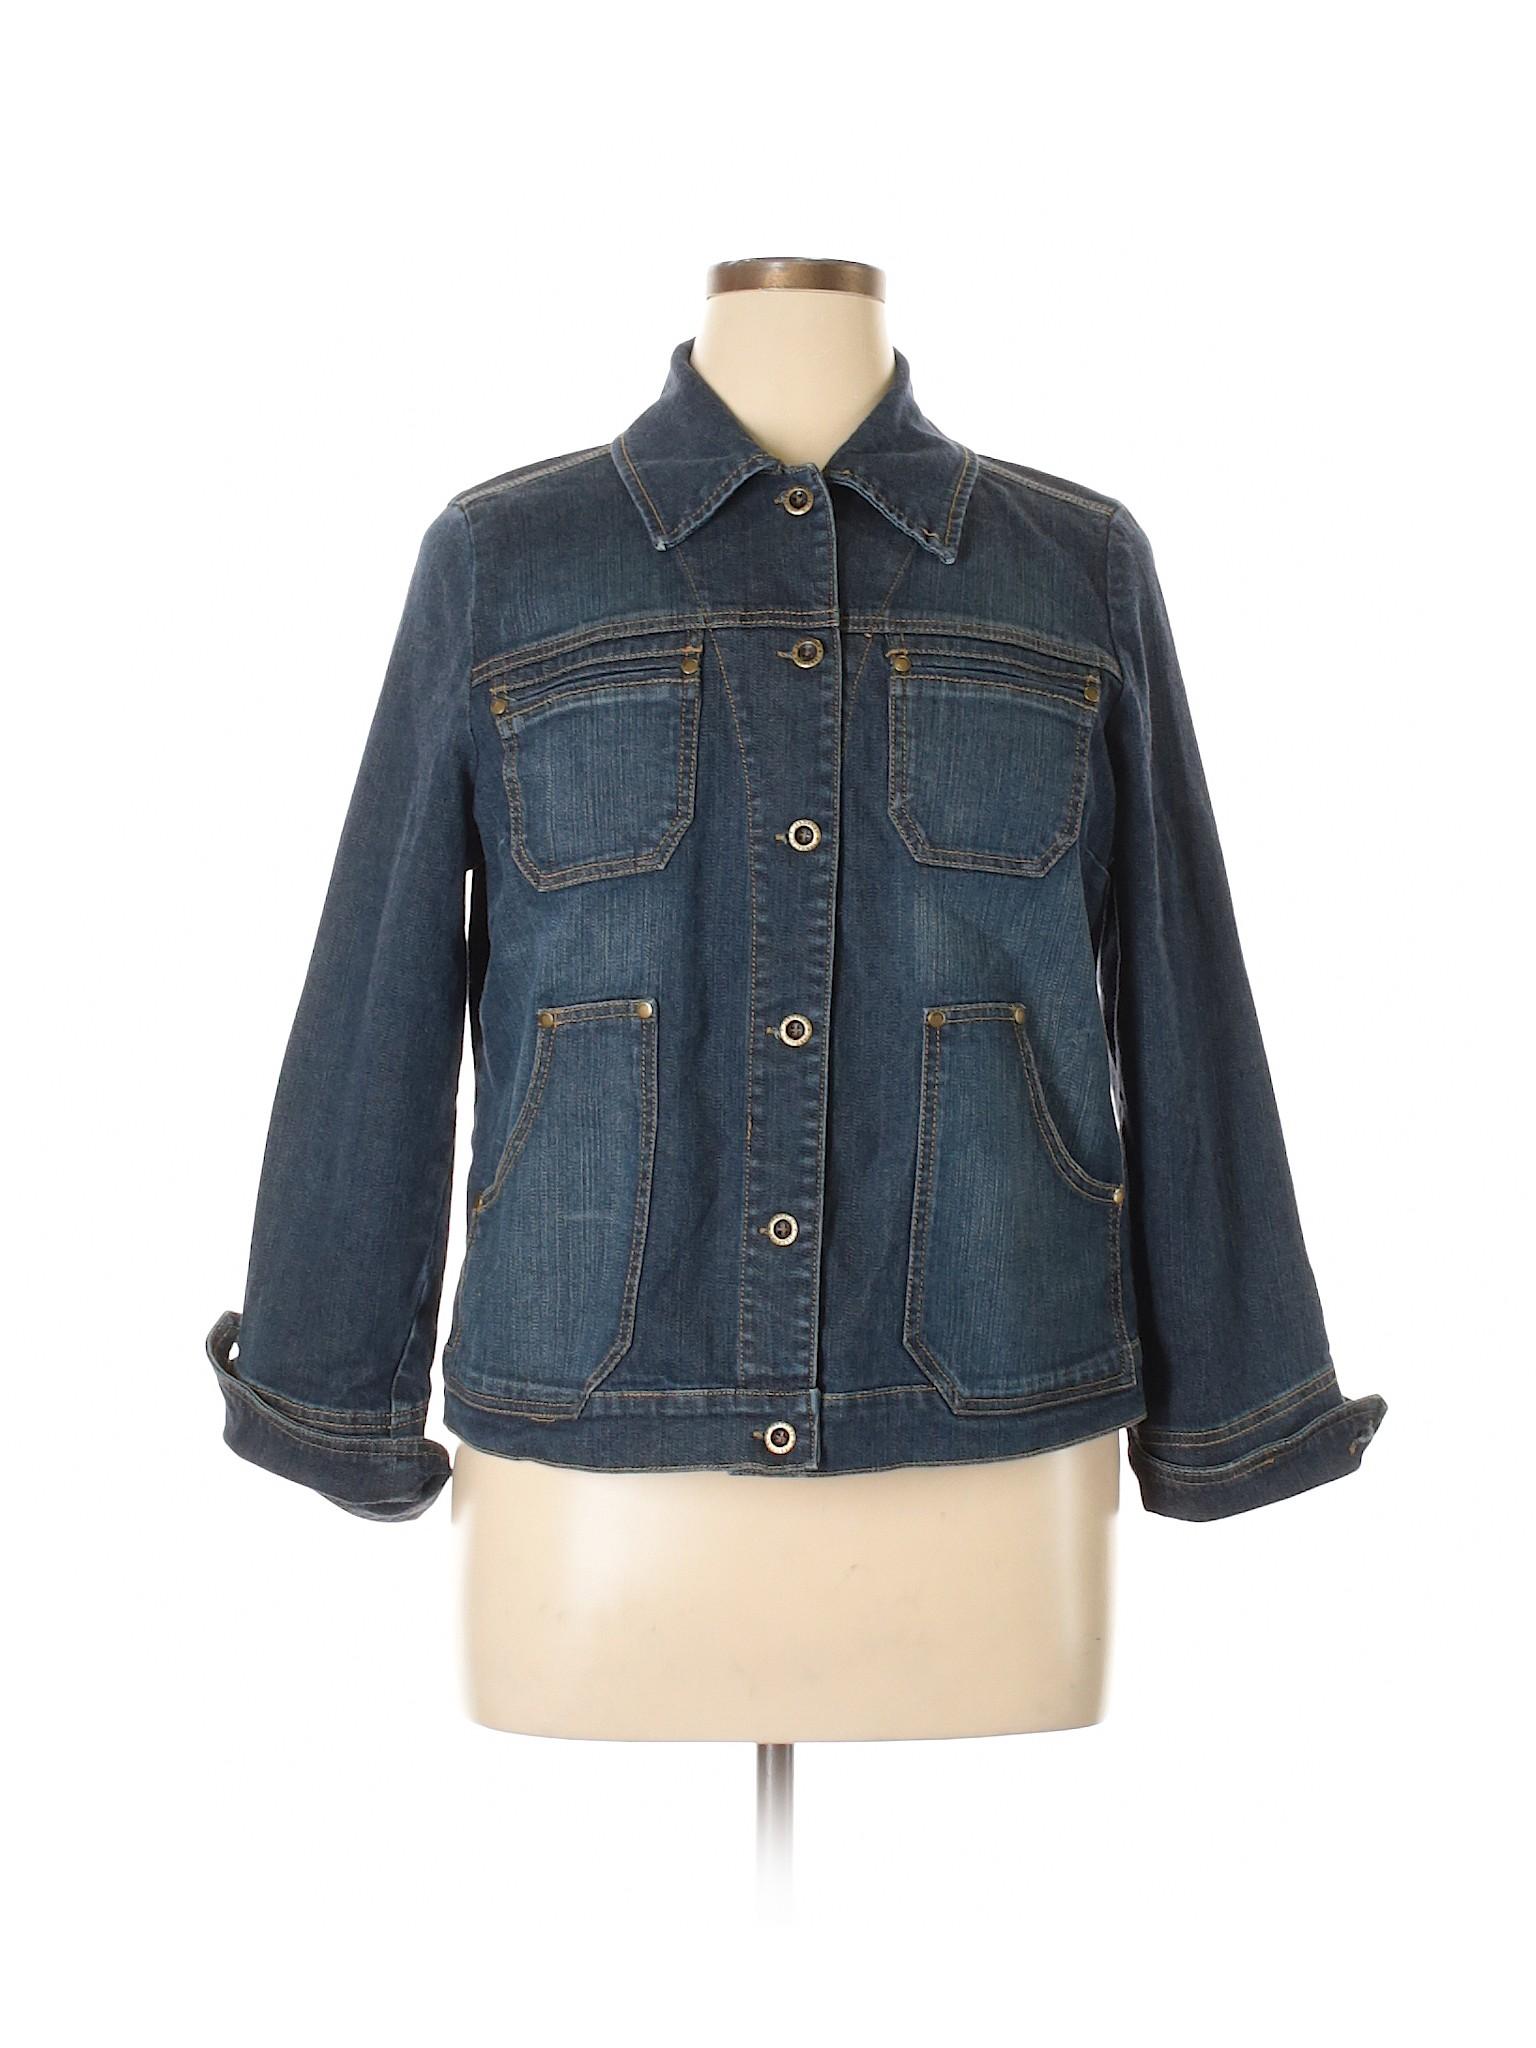 Jeanstar Boutique Boutique Jacket Denim Winter Winter rwtqOrv5x